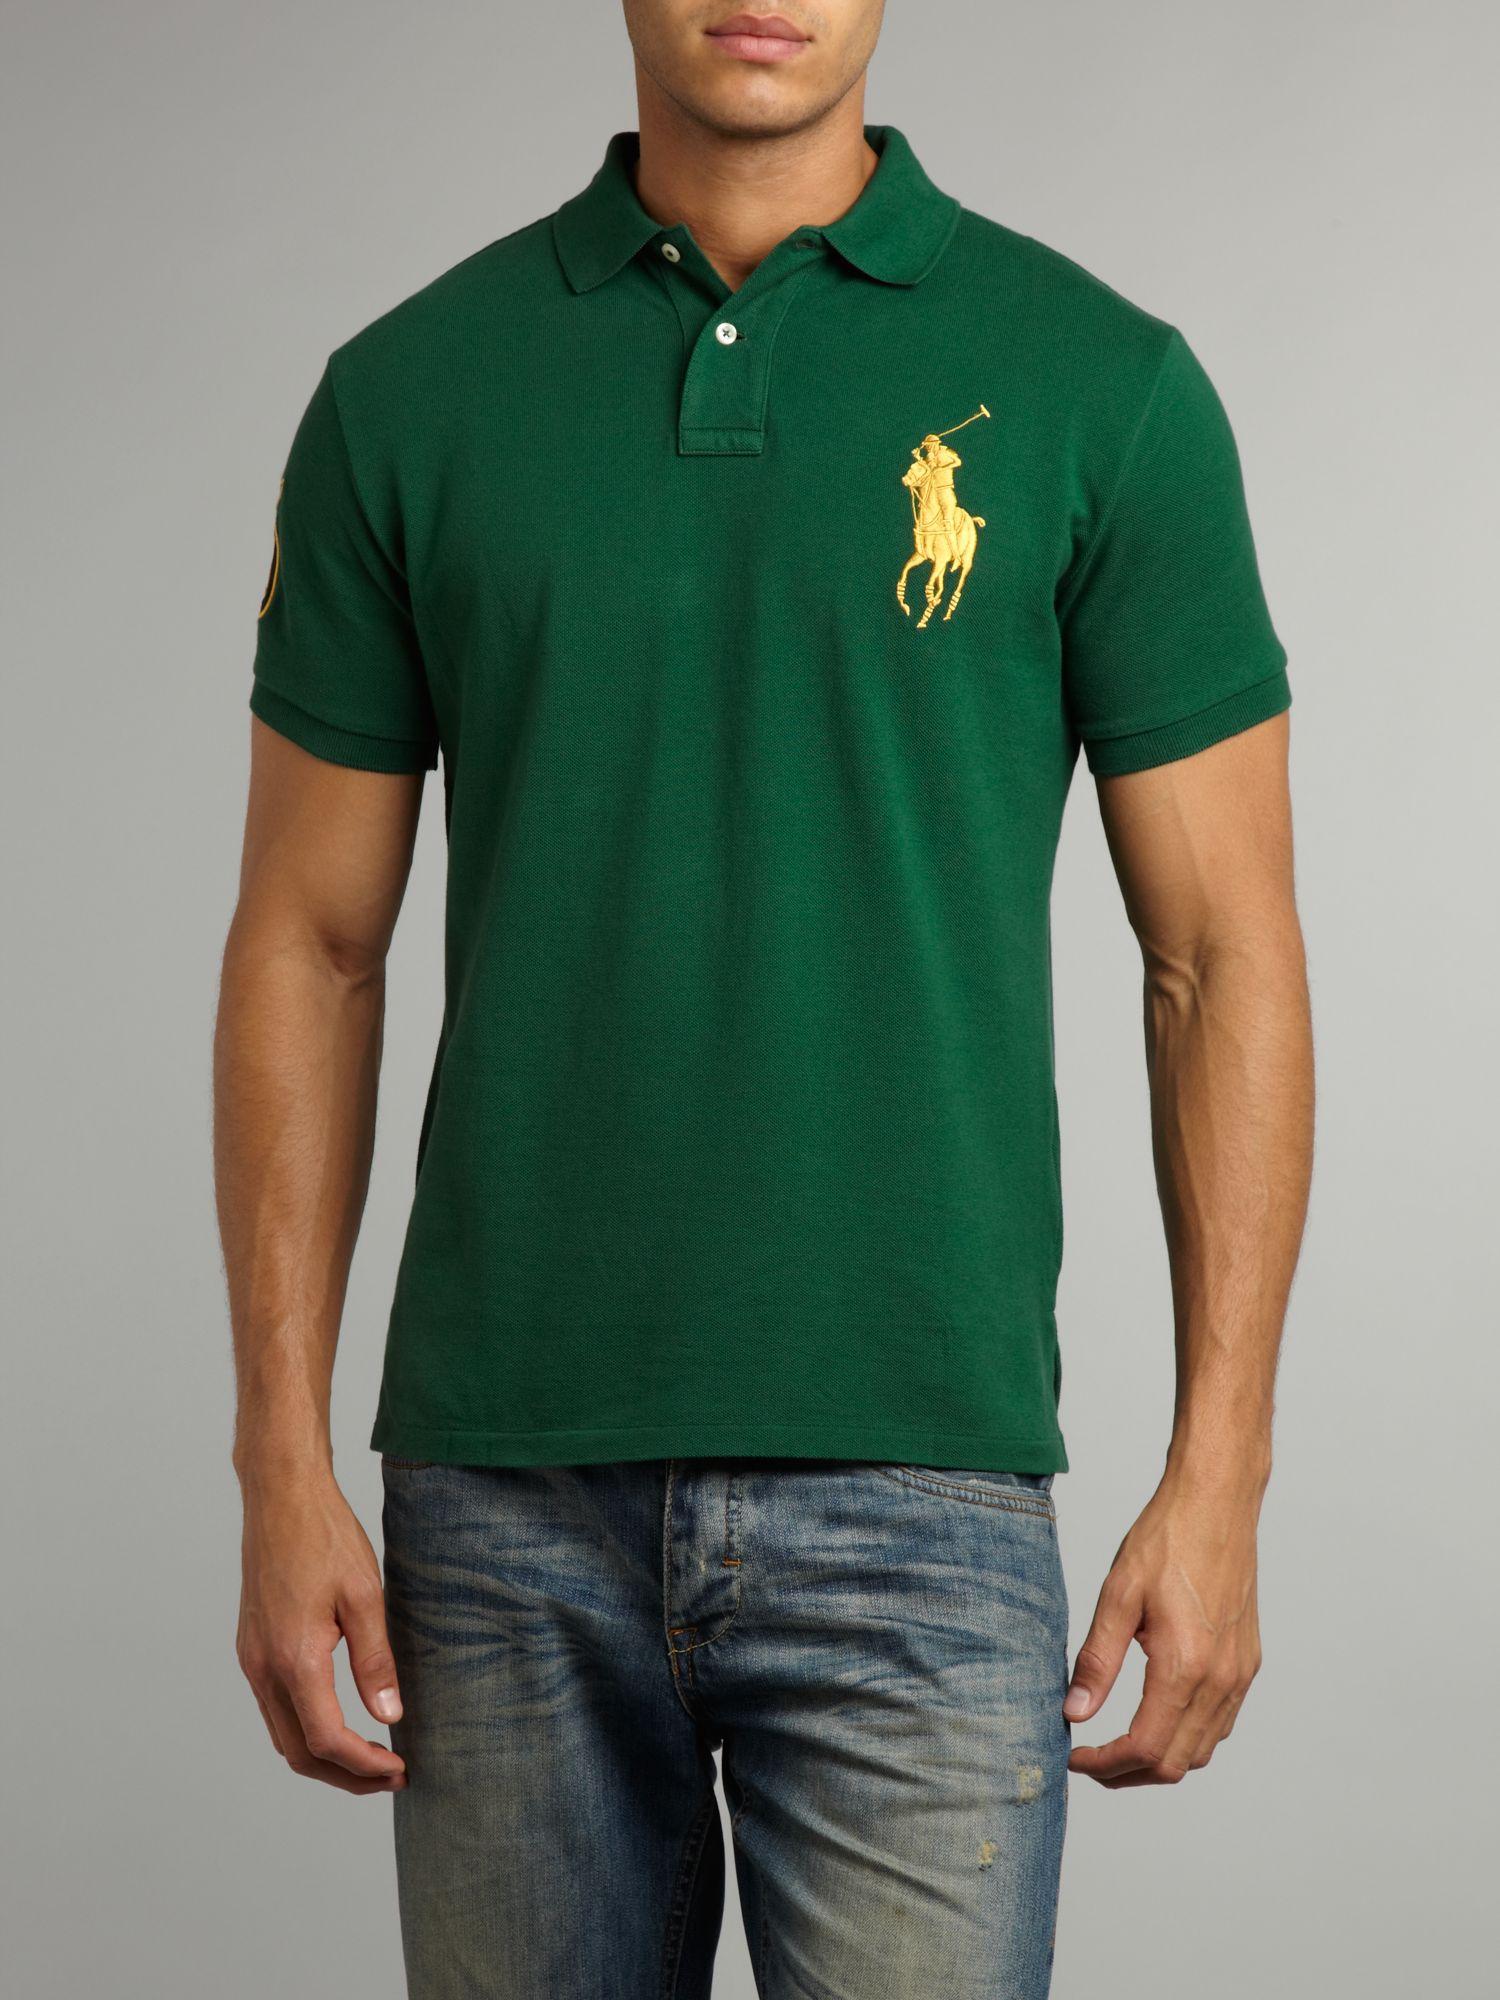 Ralph Lauren Men LONDON Green Gold Big Pony Polo